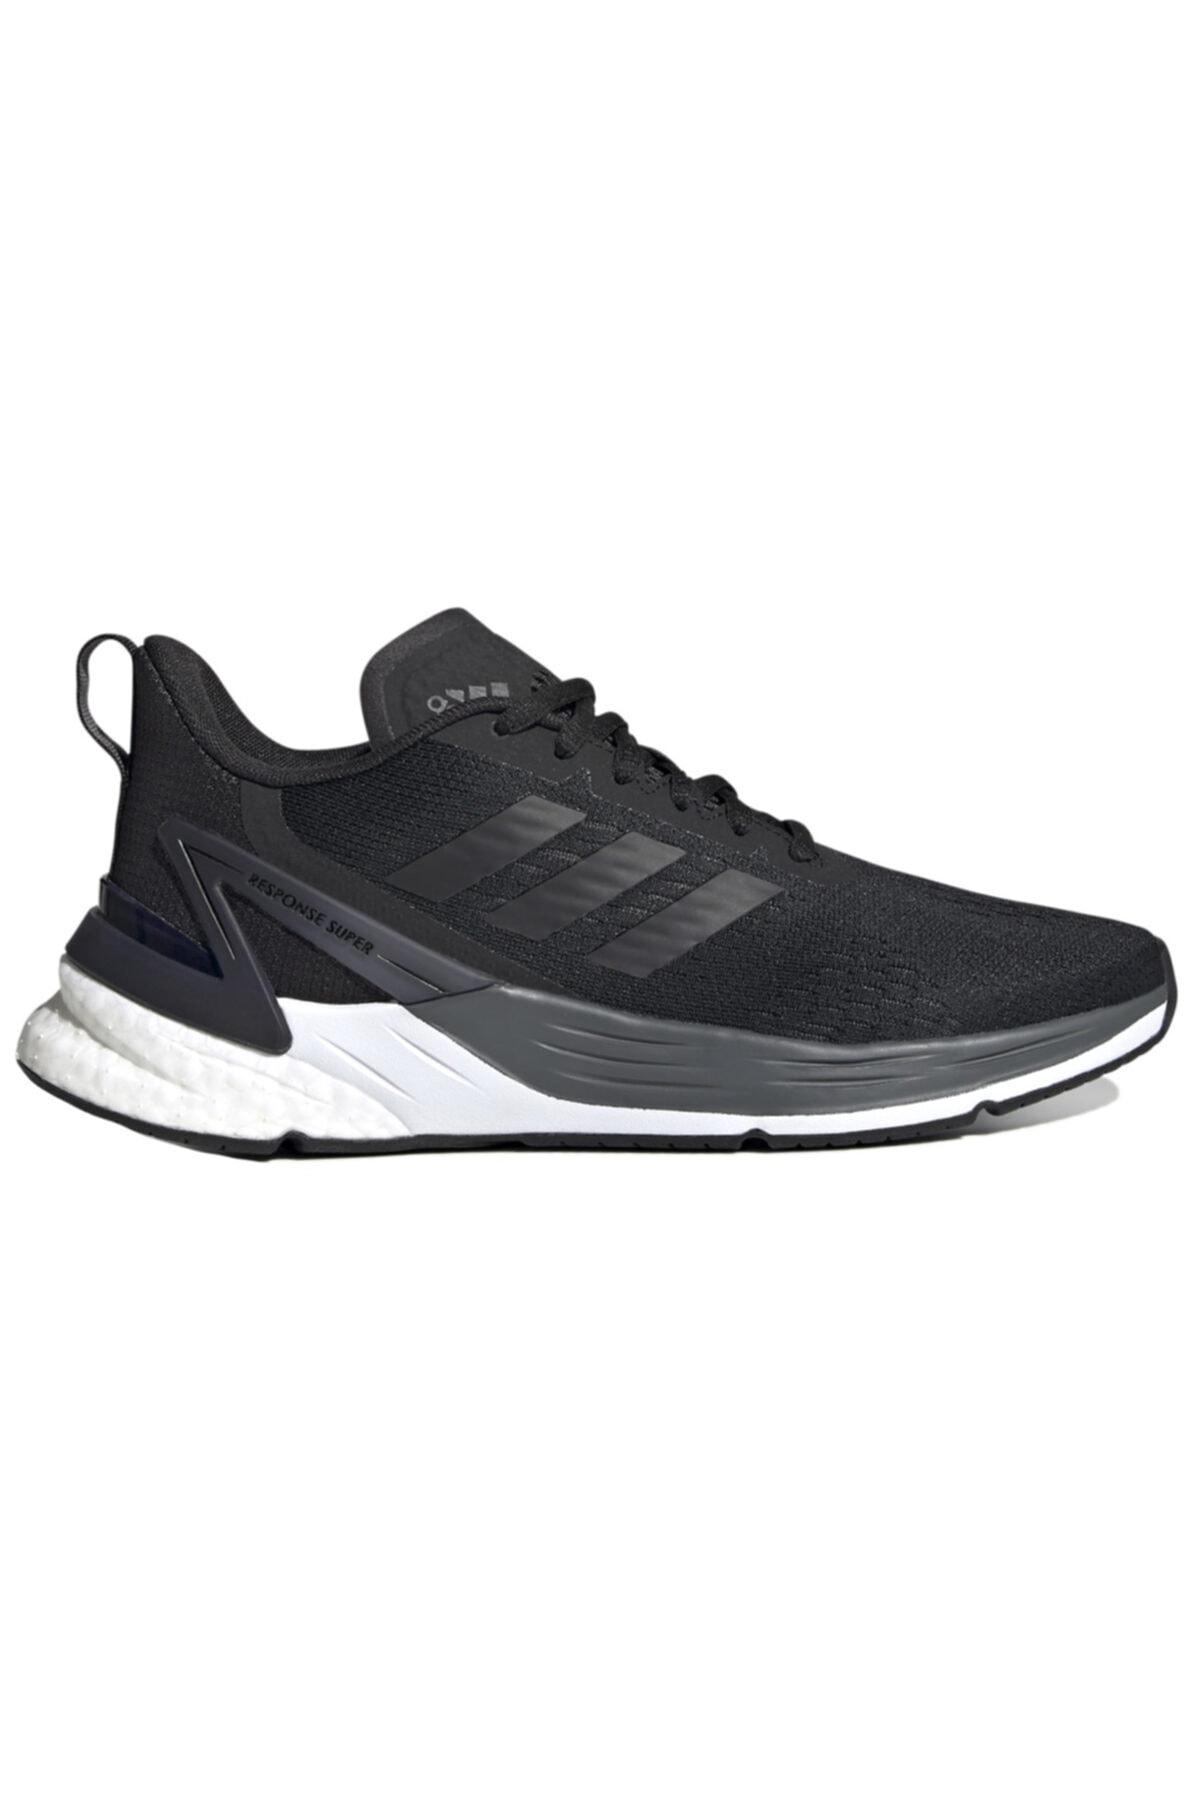 adidas Response Sr 5.0 Boost Kadın Siyah Koşu Ayakkabısı Fx4833 1